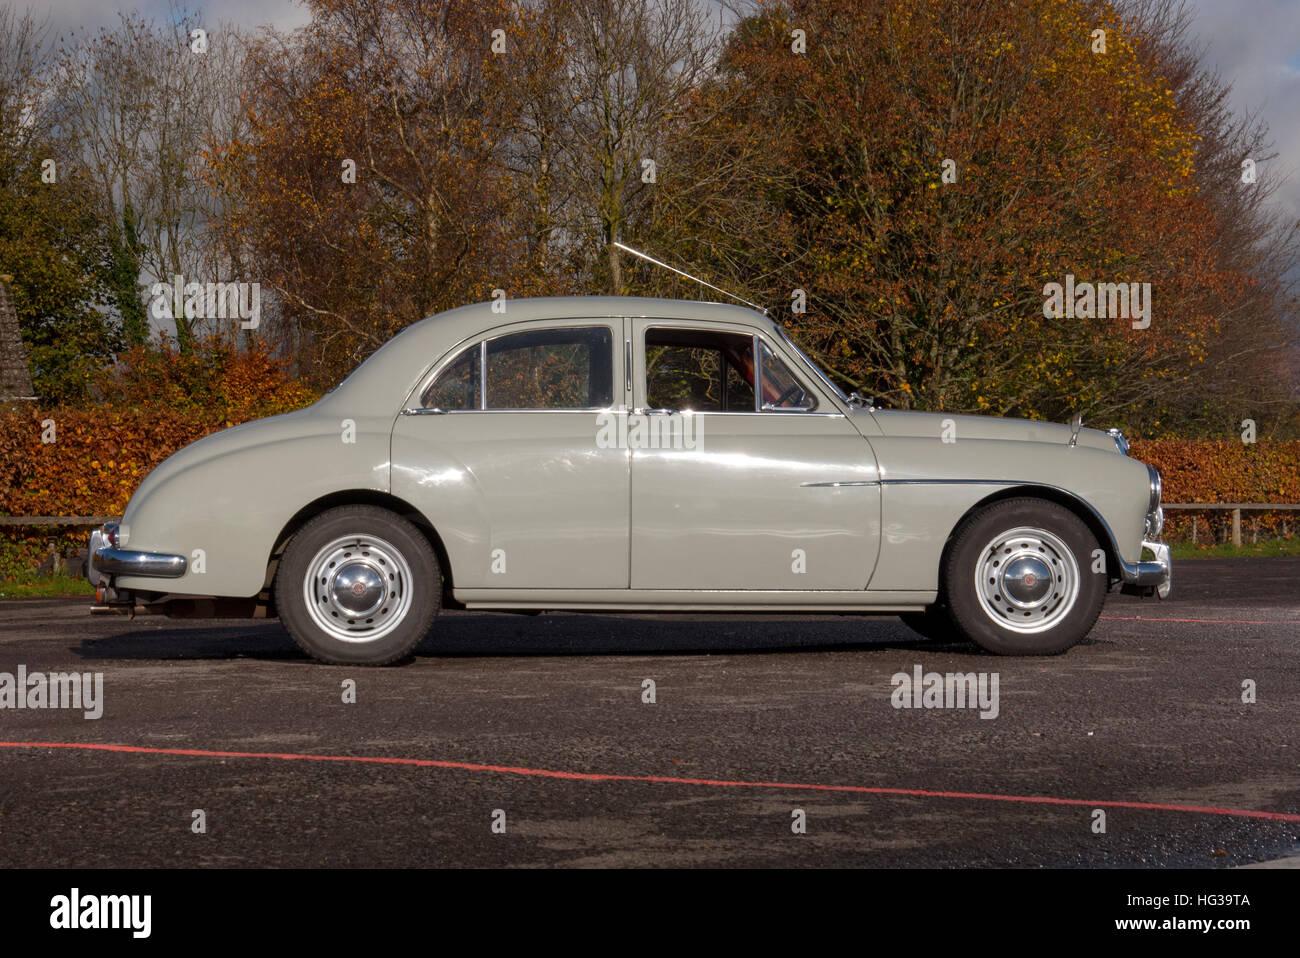 MG Magnette ZA classic British sports saloon car - Stock Image